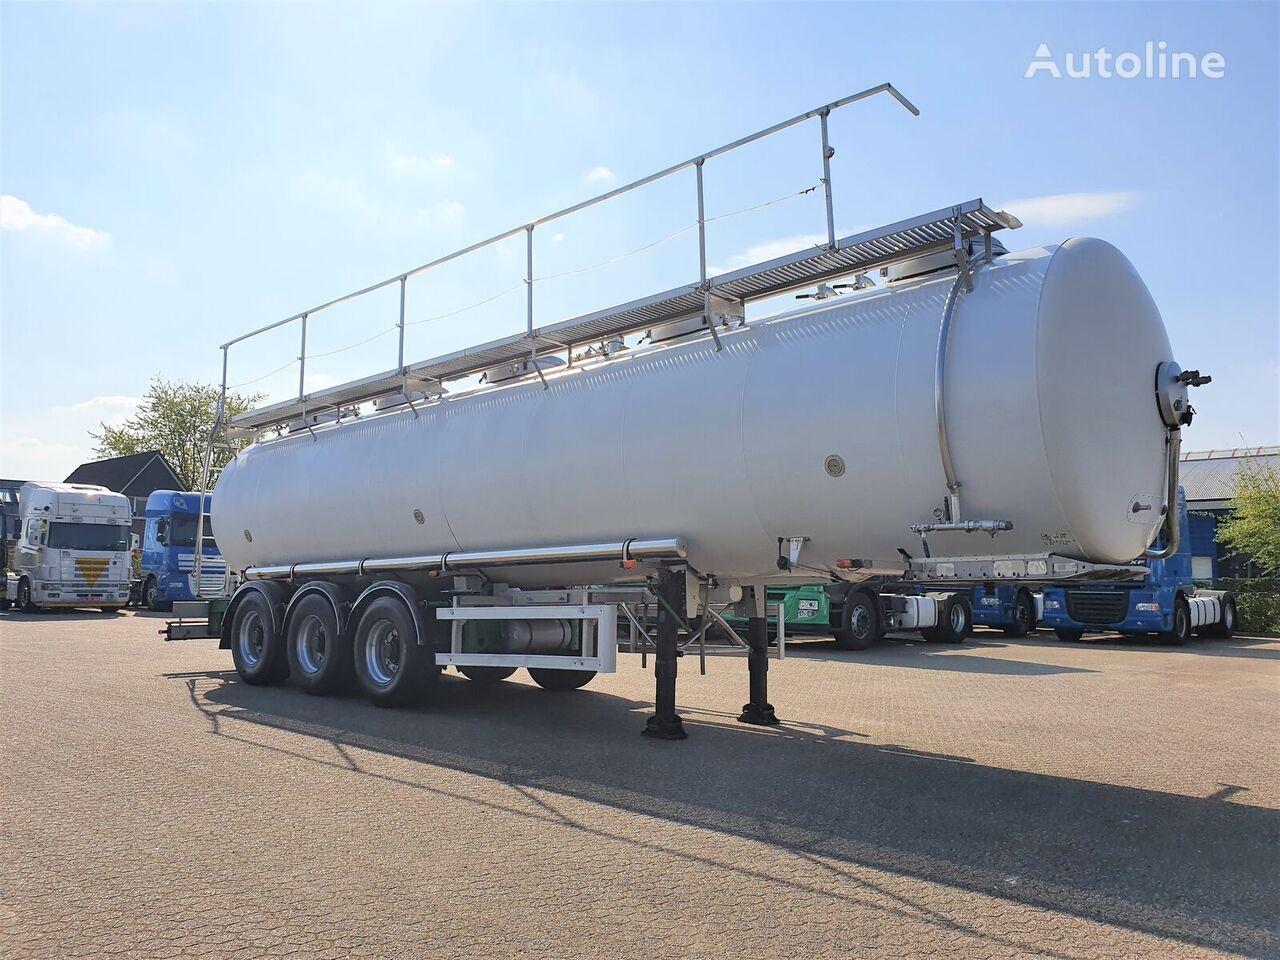 MAISONNEUVE Maisoneuve INOX Food tank 29m3 - 3 comp - Heated - Pressure cisterna alimentaria